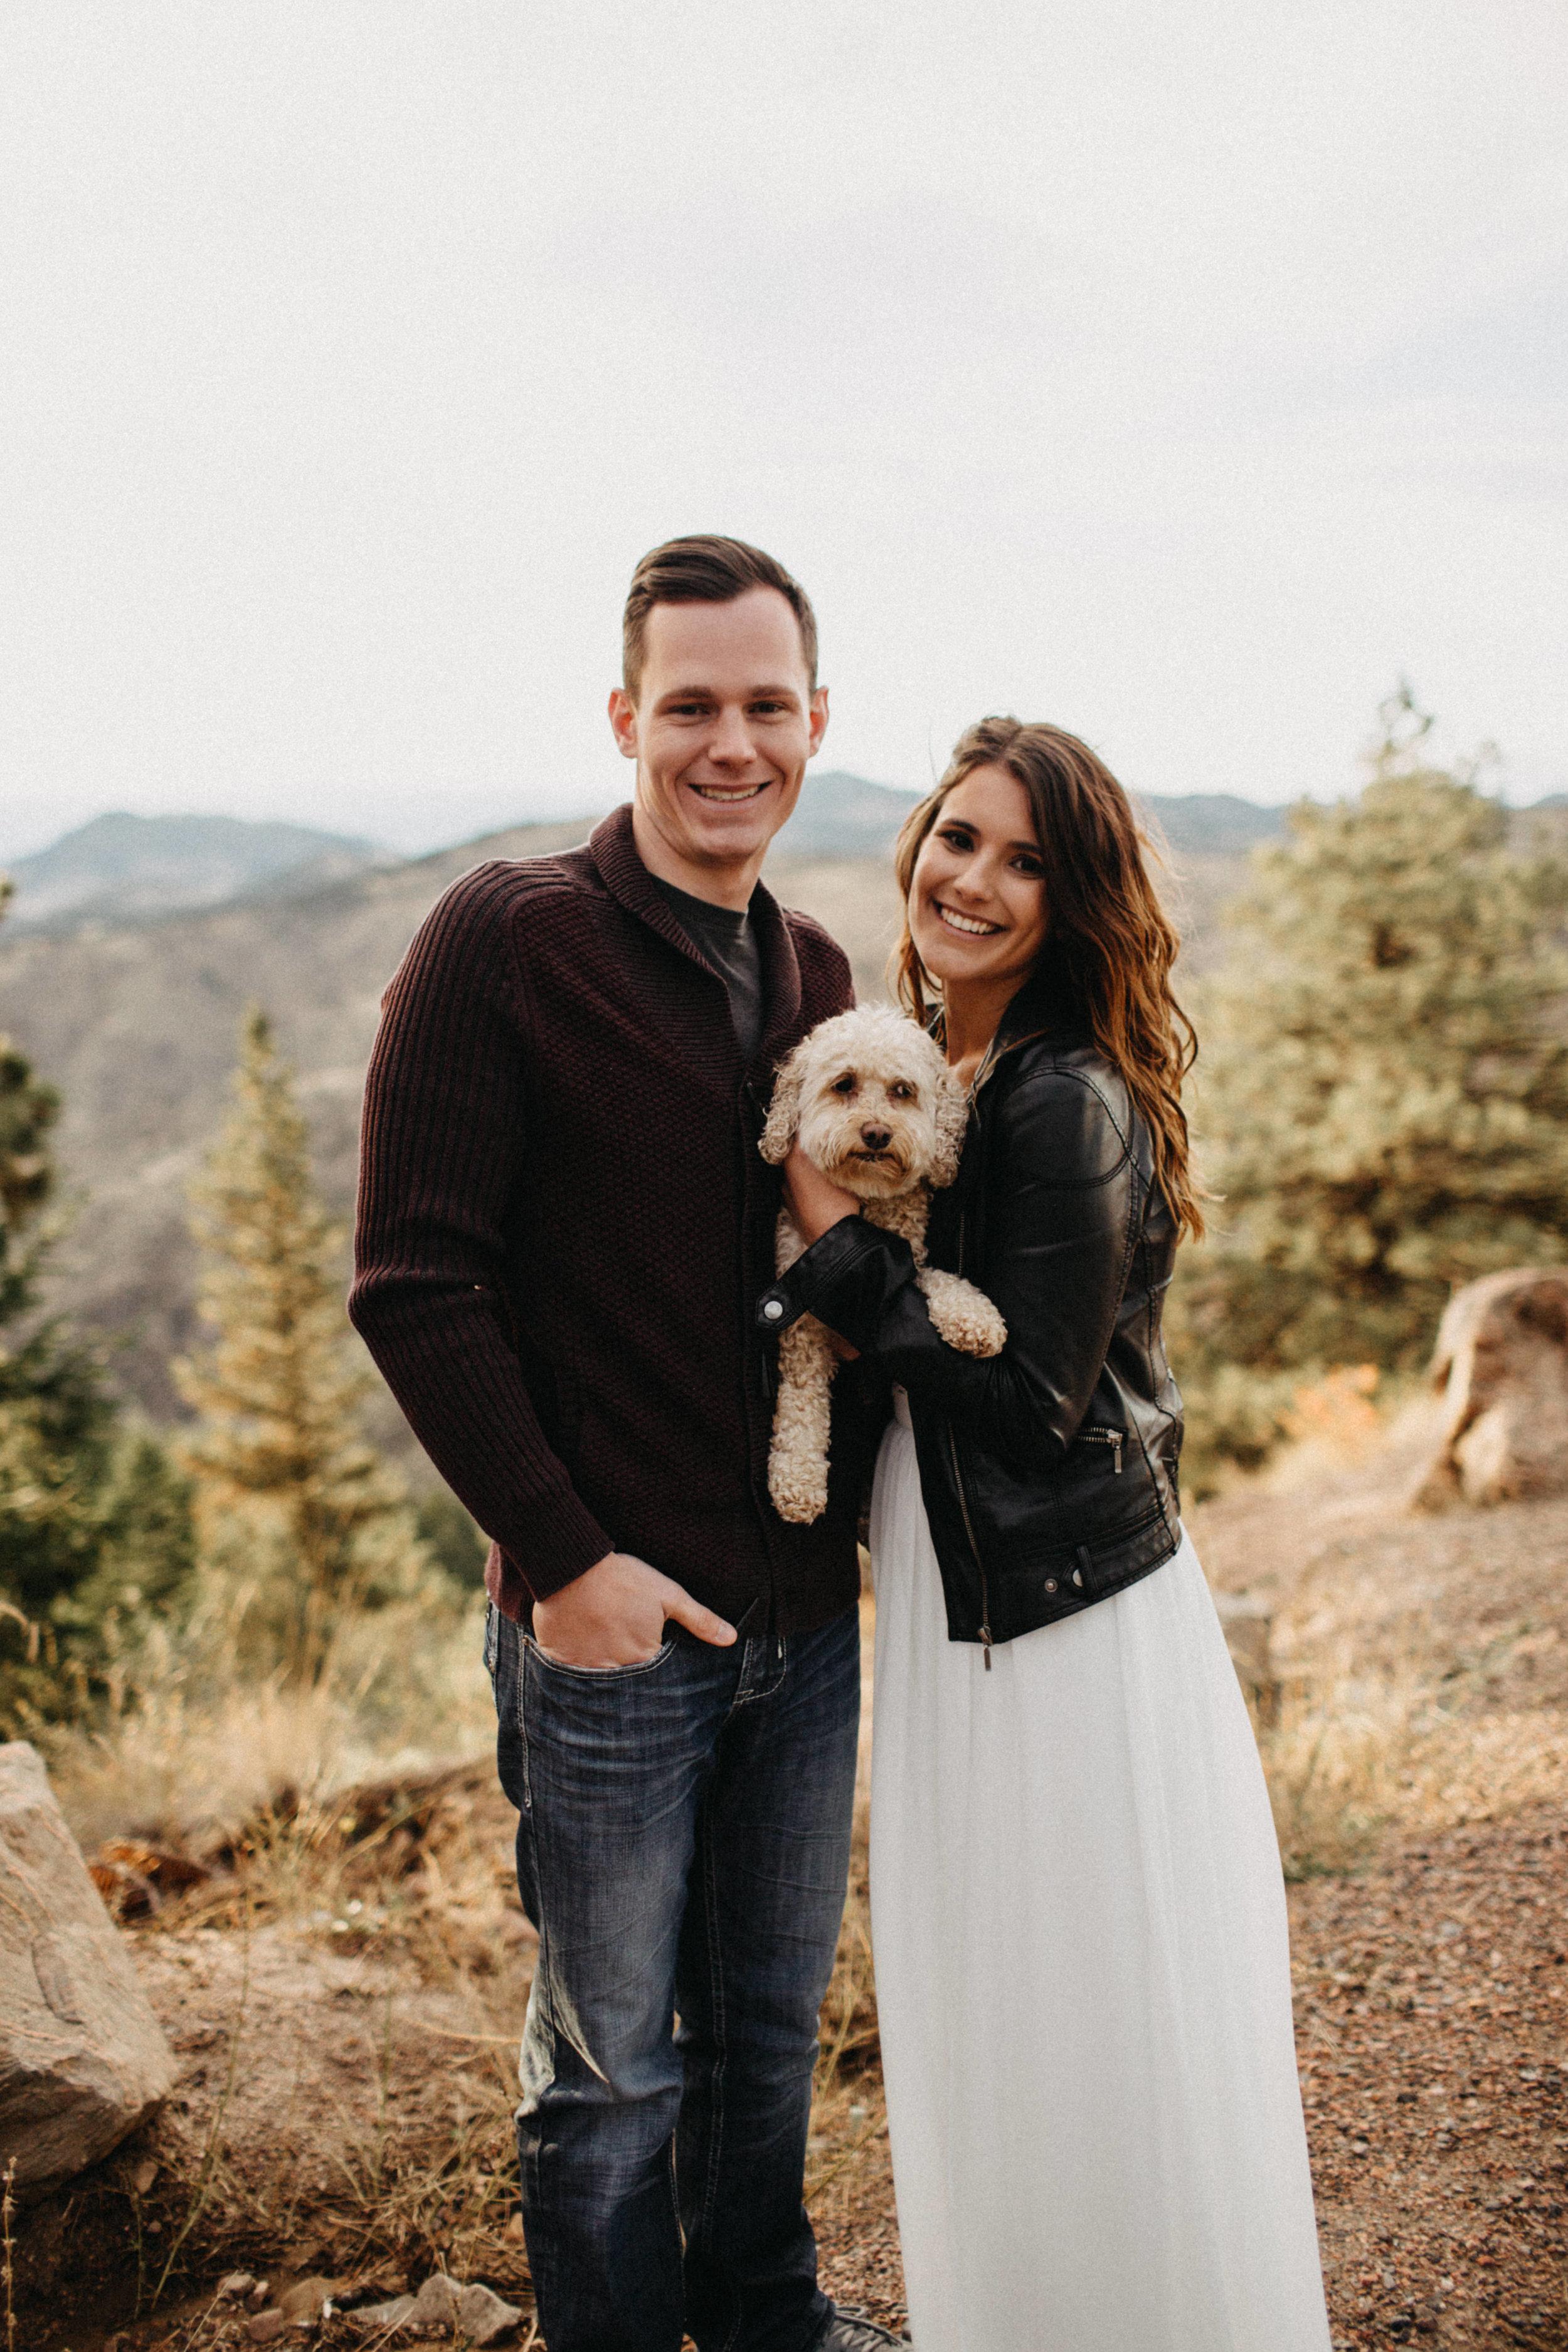 Adventurous Elopement Photography at Lookout Mountain, Colorado